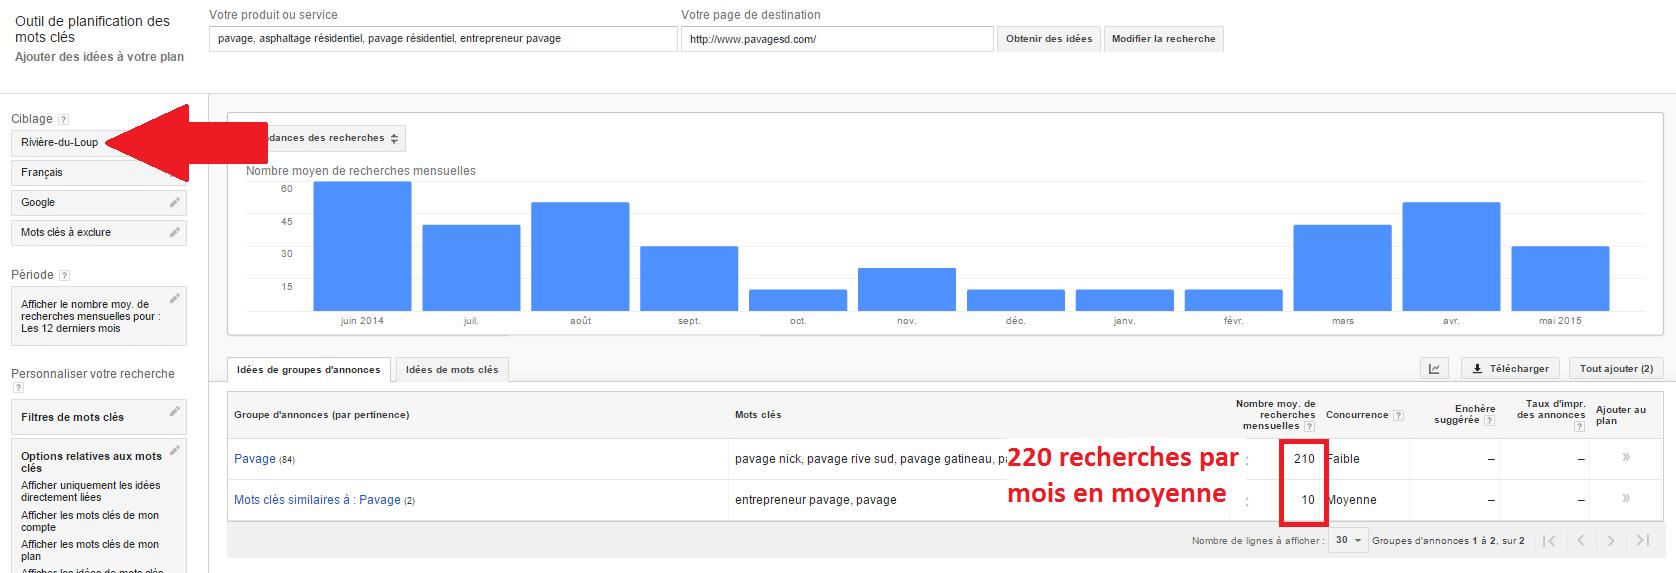 pavage-riviere-du-loup